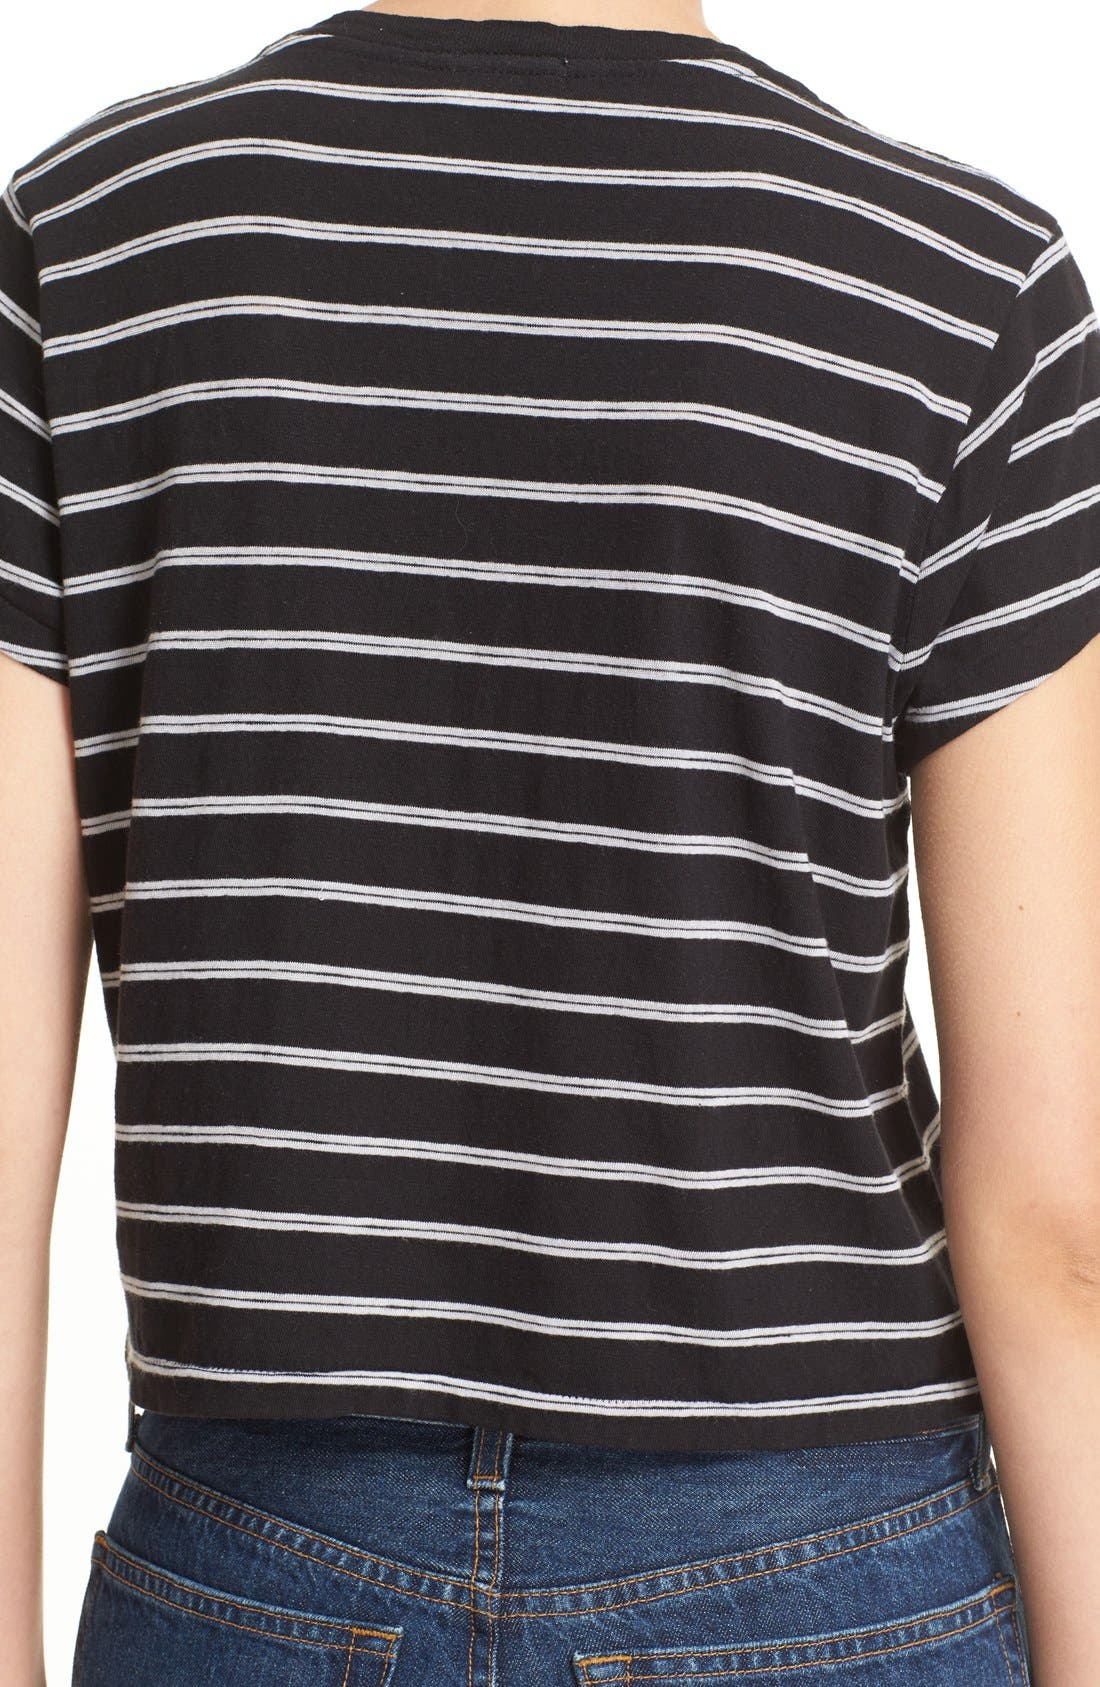 'Originals' Stripe Boxy Cotton Tee,                             Alternate thumbnail 5, color,                             001